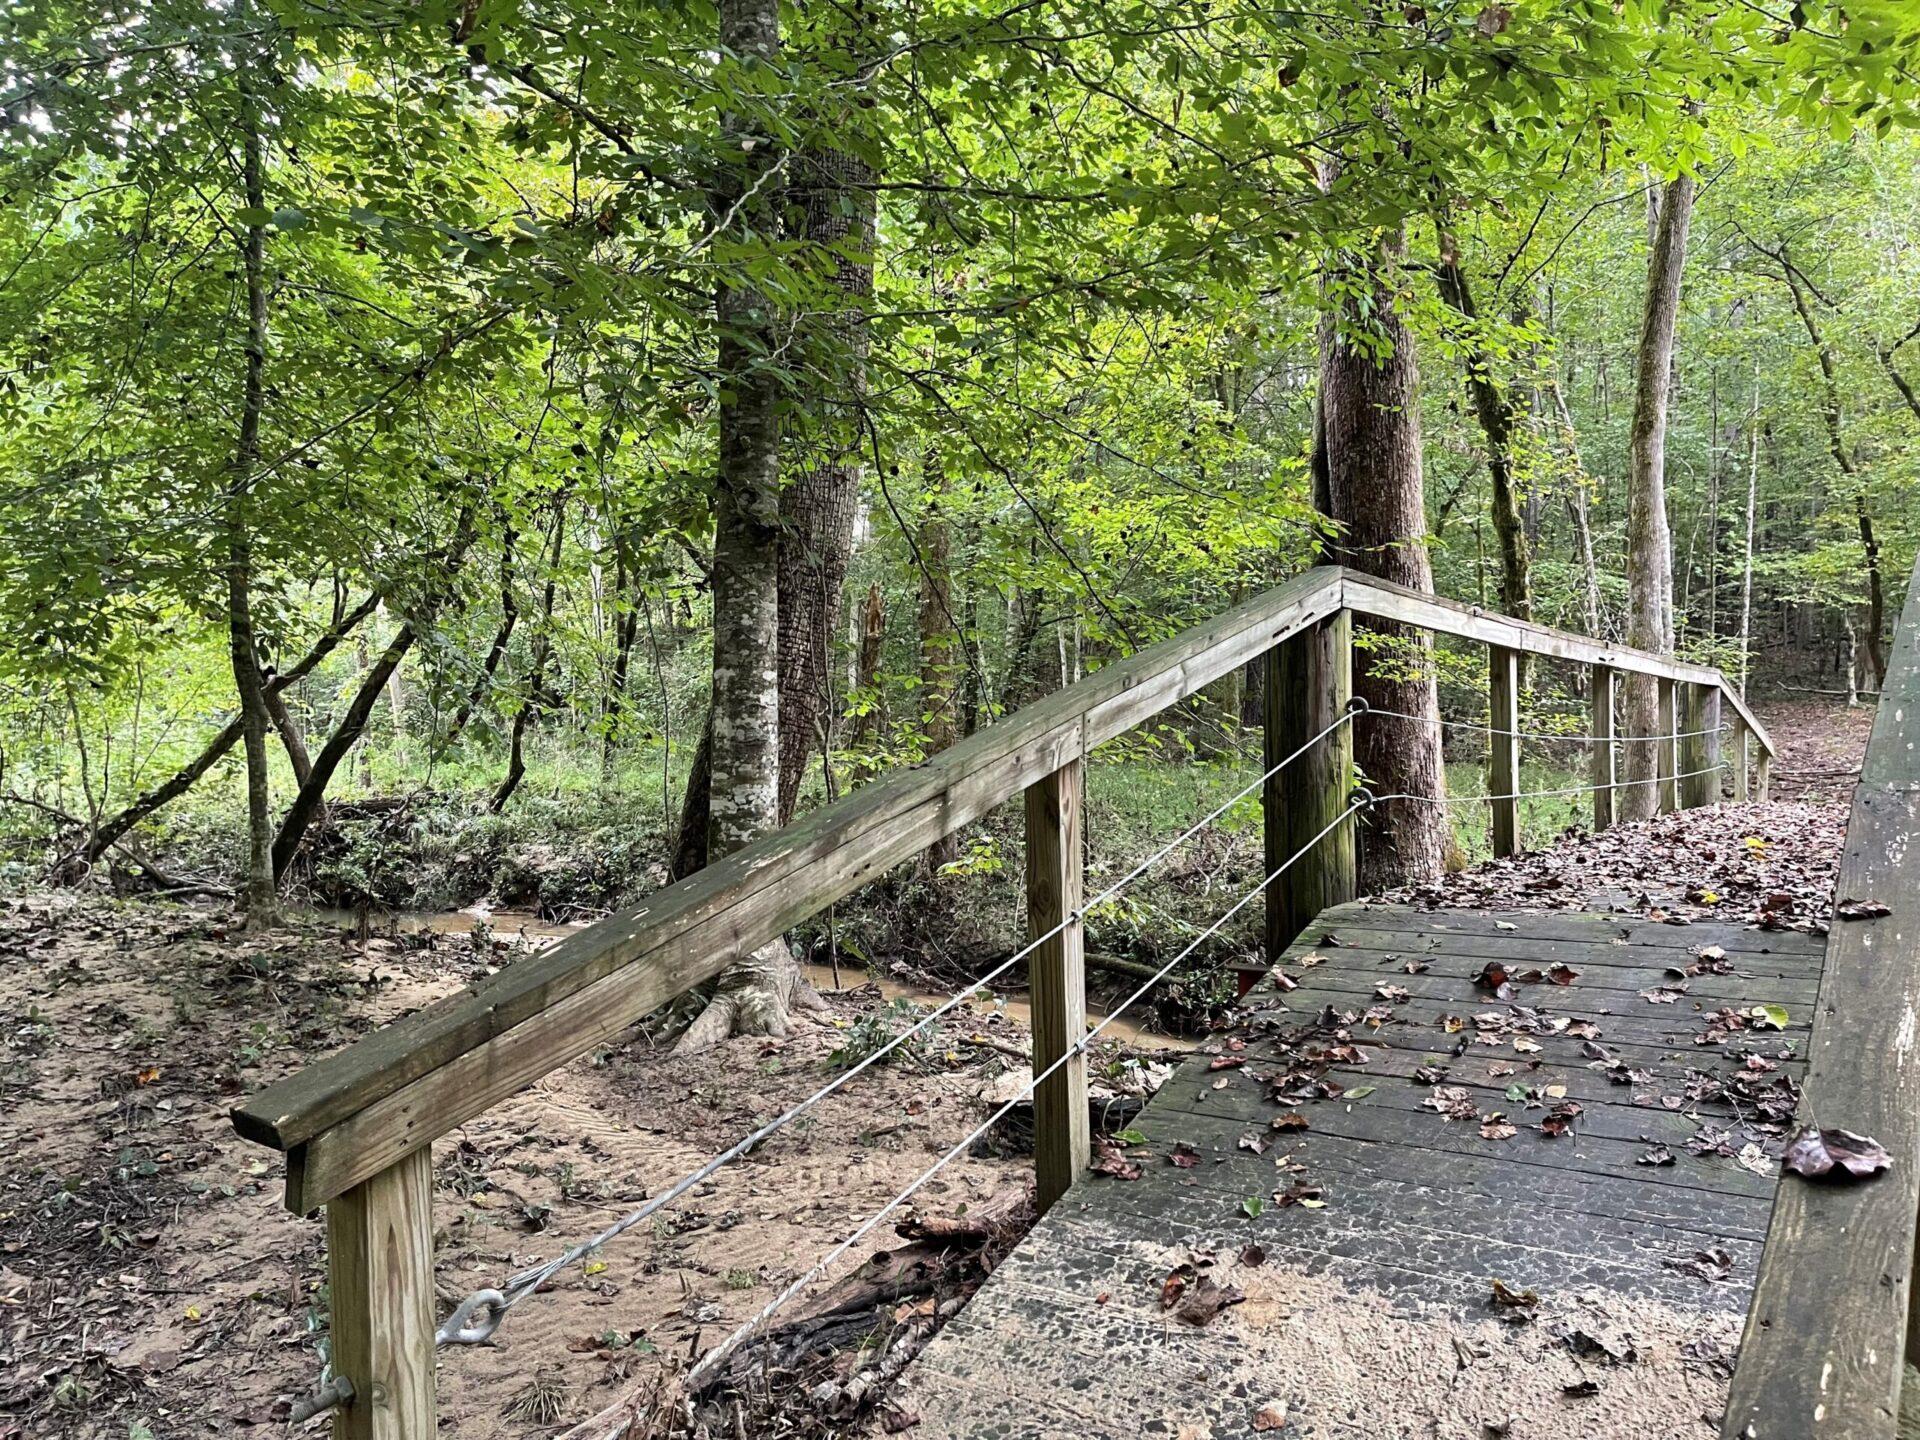 Trail at the Charles E. Bailey Sportplex